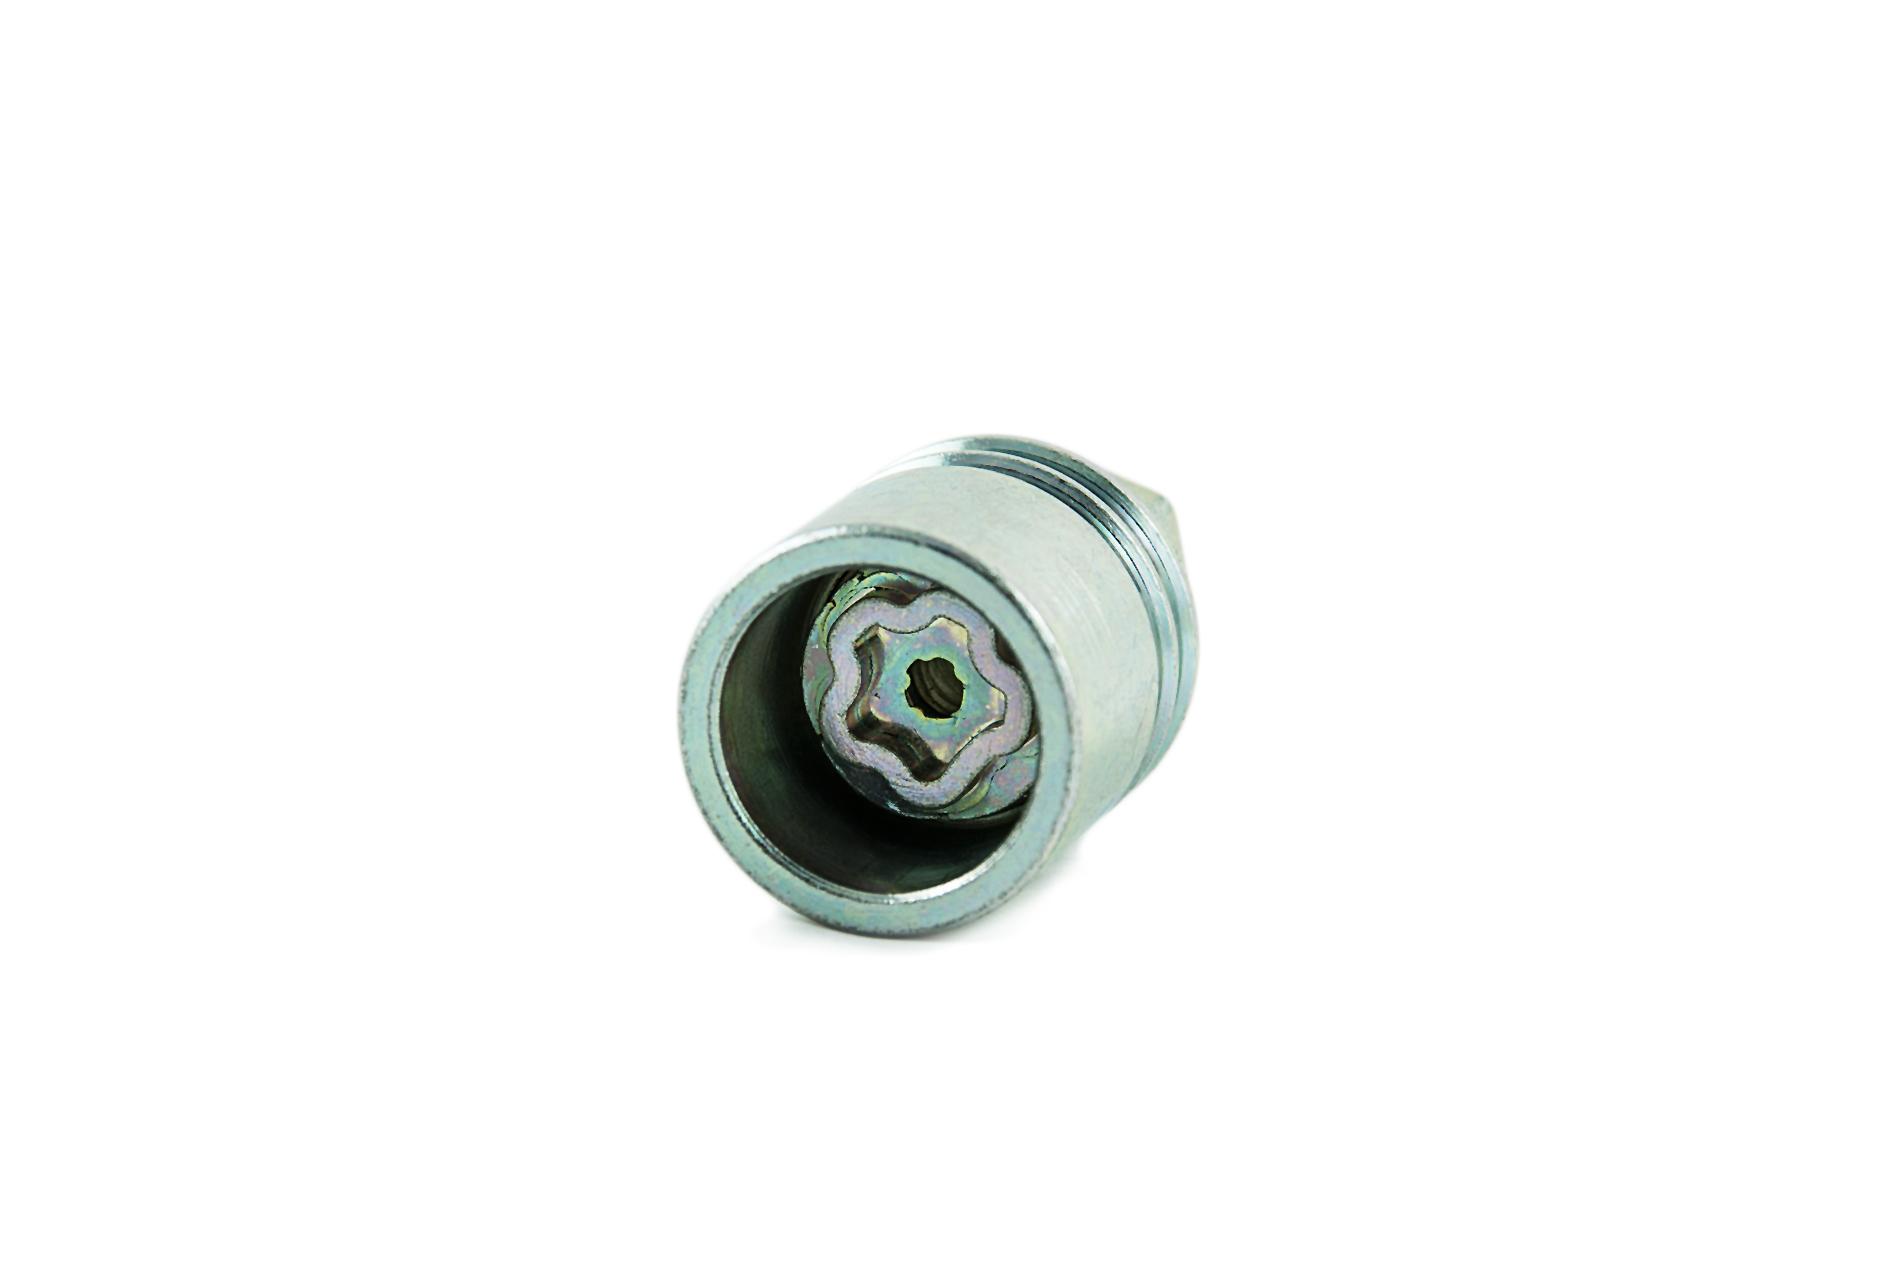 Nissan Genuine Mcgard Locking Wheel Nut Key 19mm Head